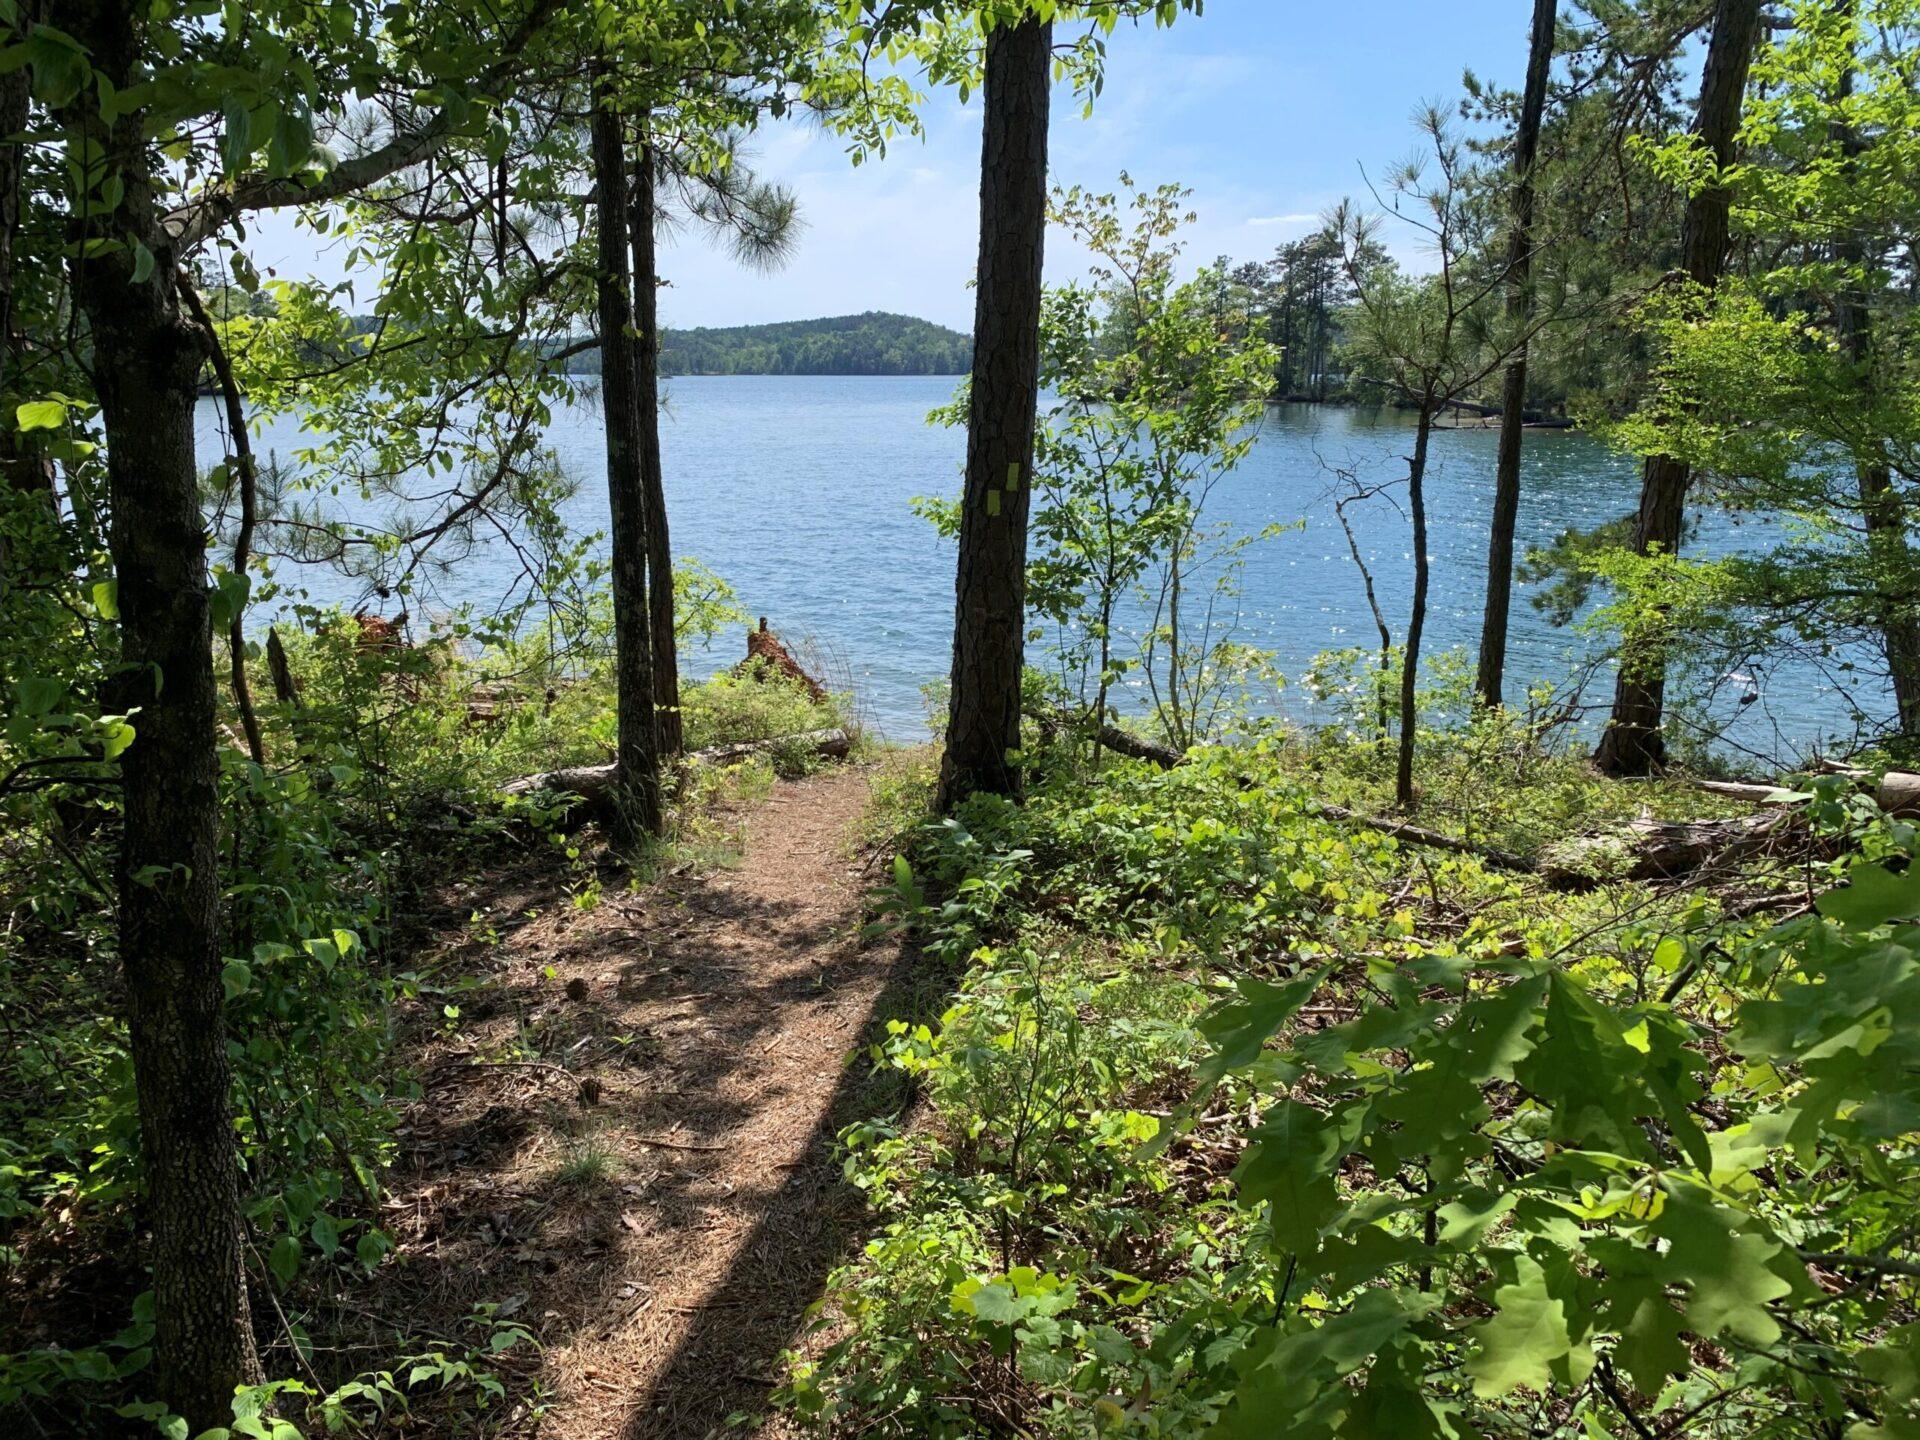 CRATA trail at Overlook Park